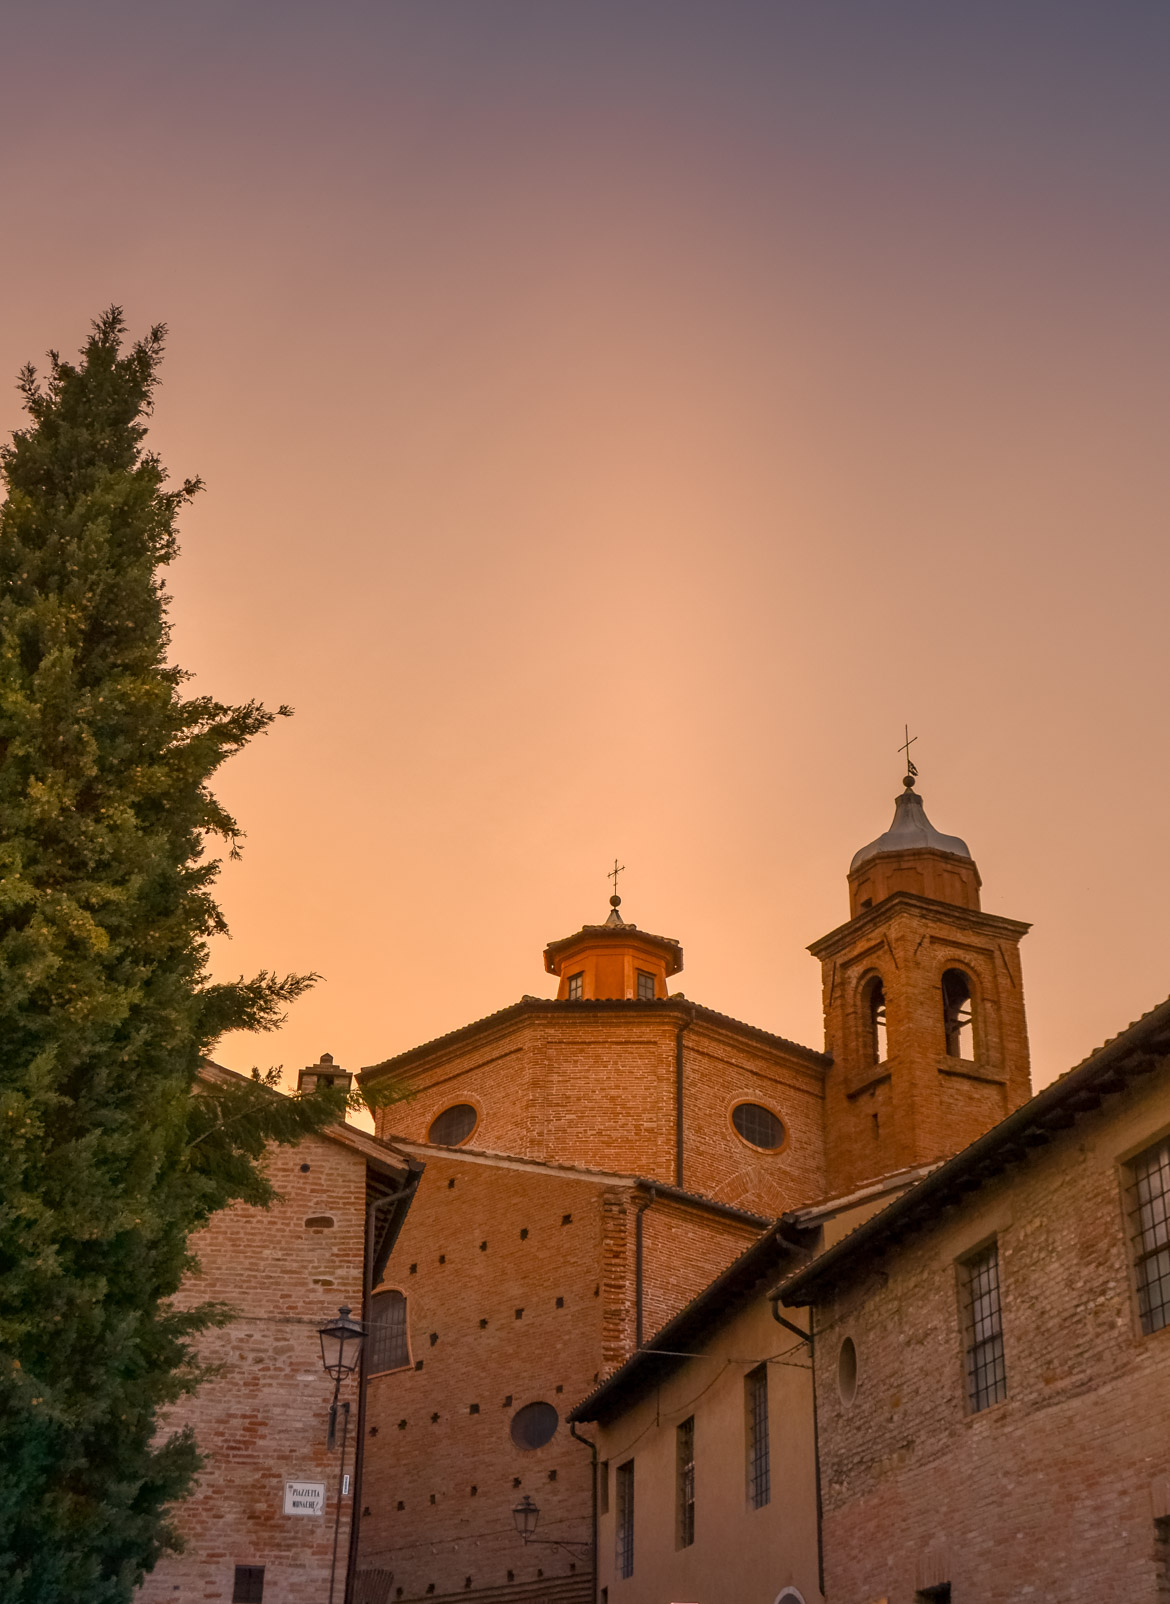 Convento Santarcangelo di Romagna - In Viaggio Con Monica